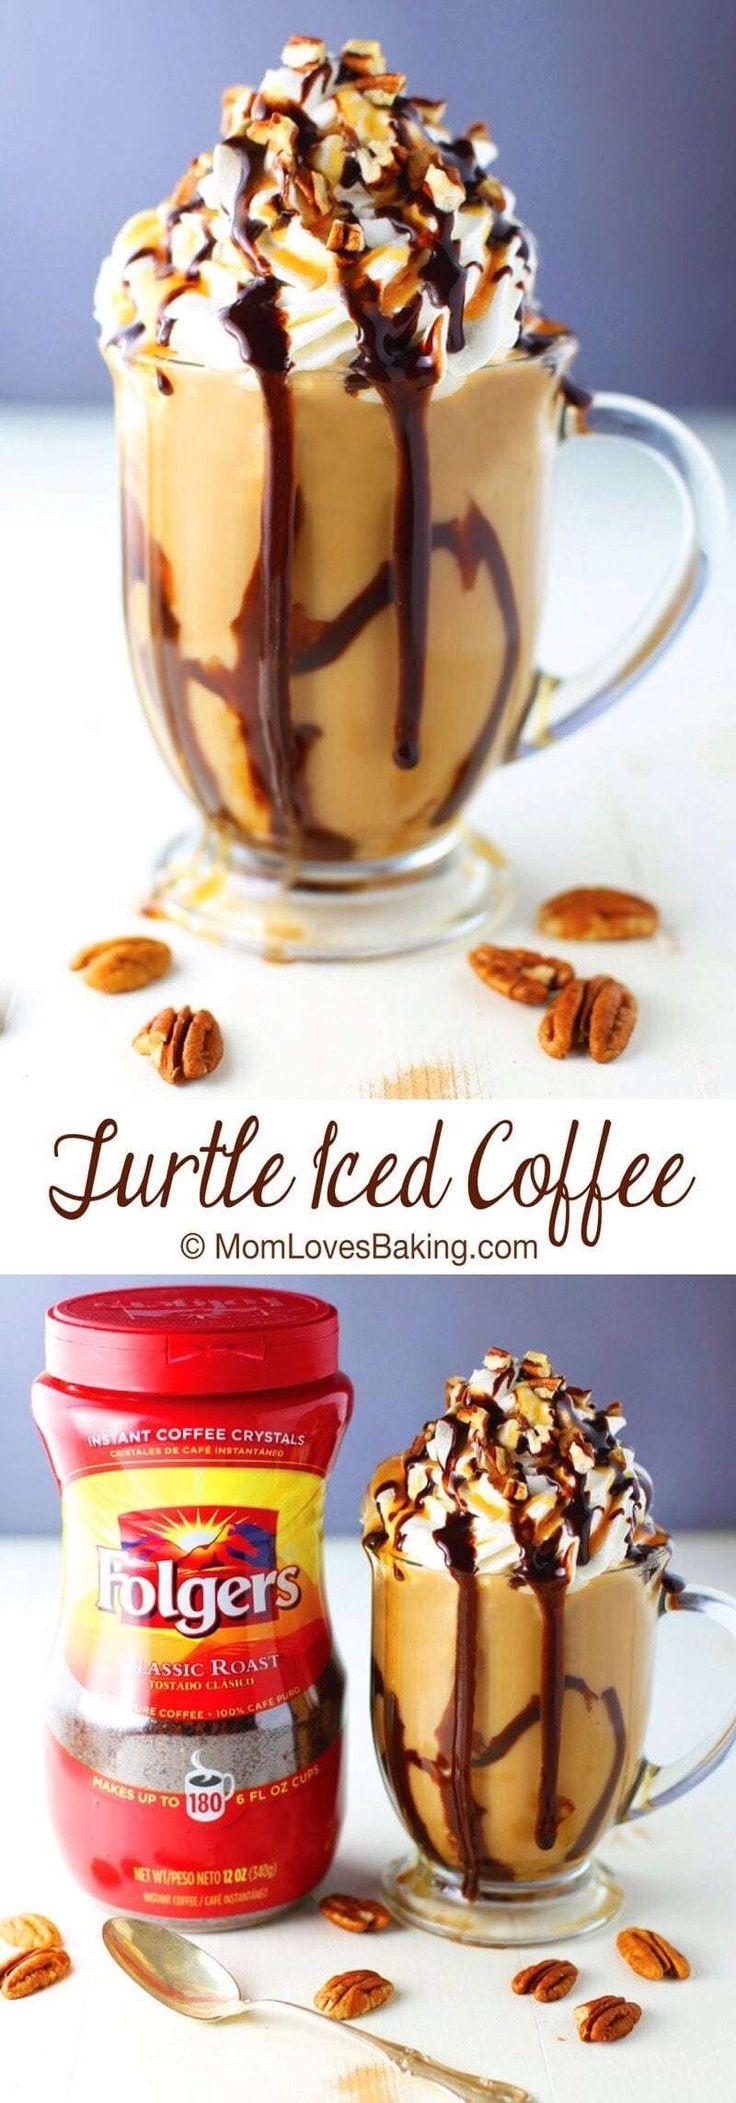 iced coffee syrup recipe